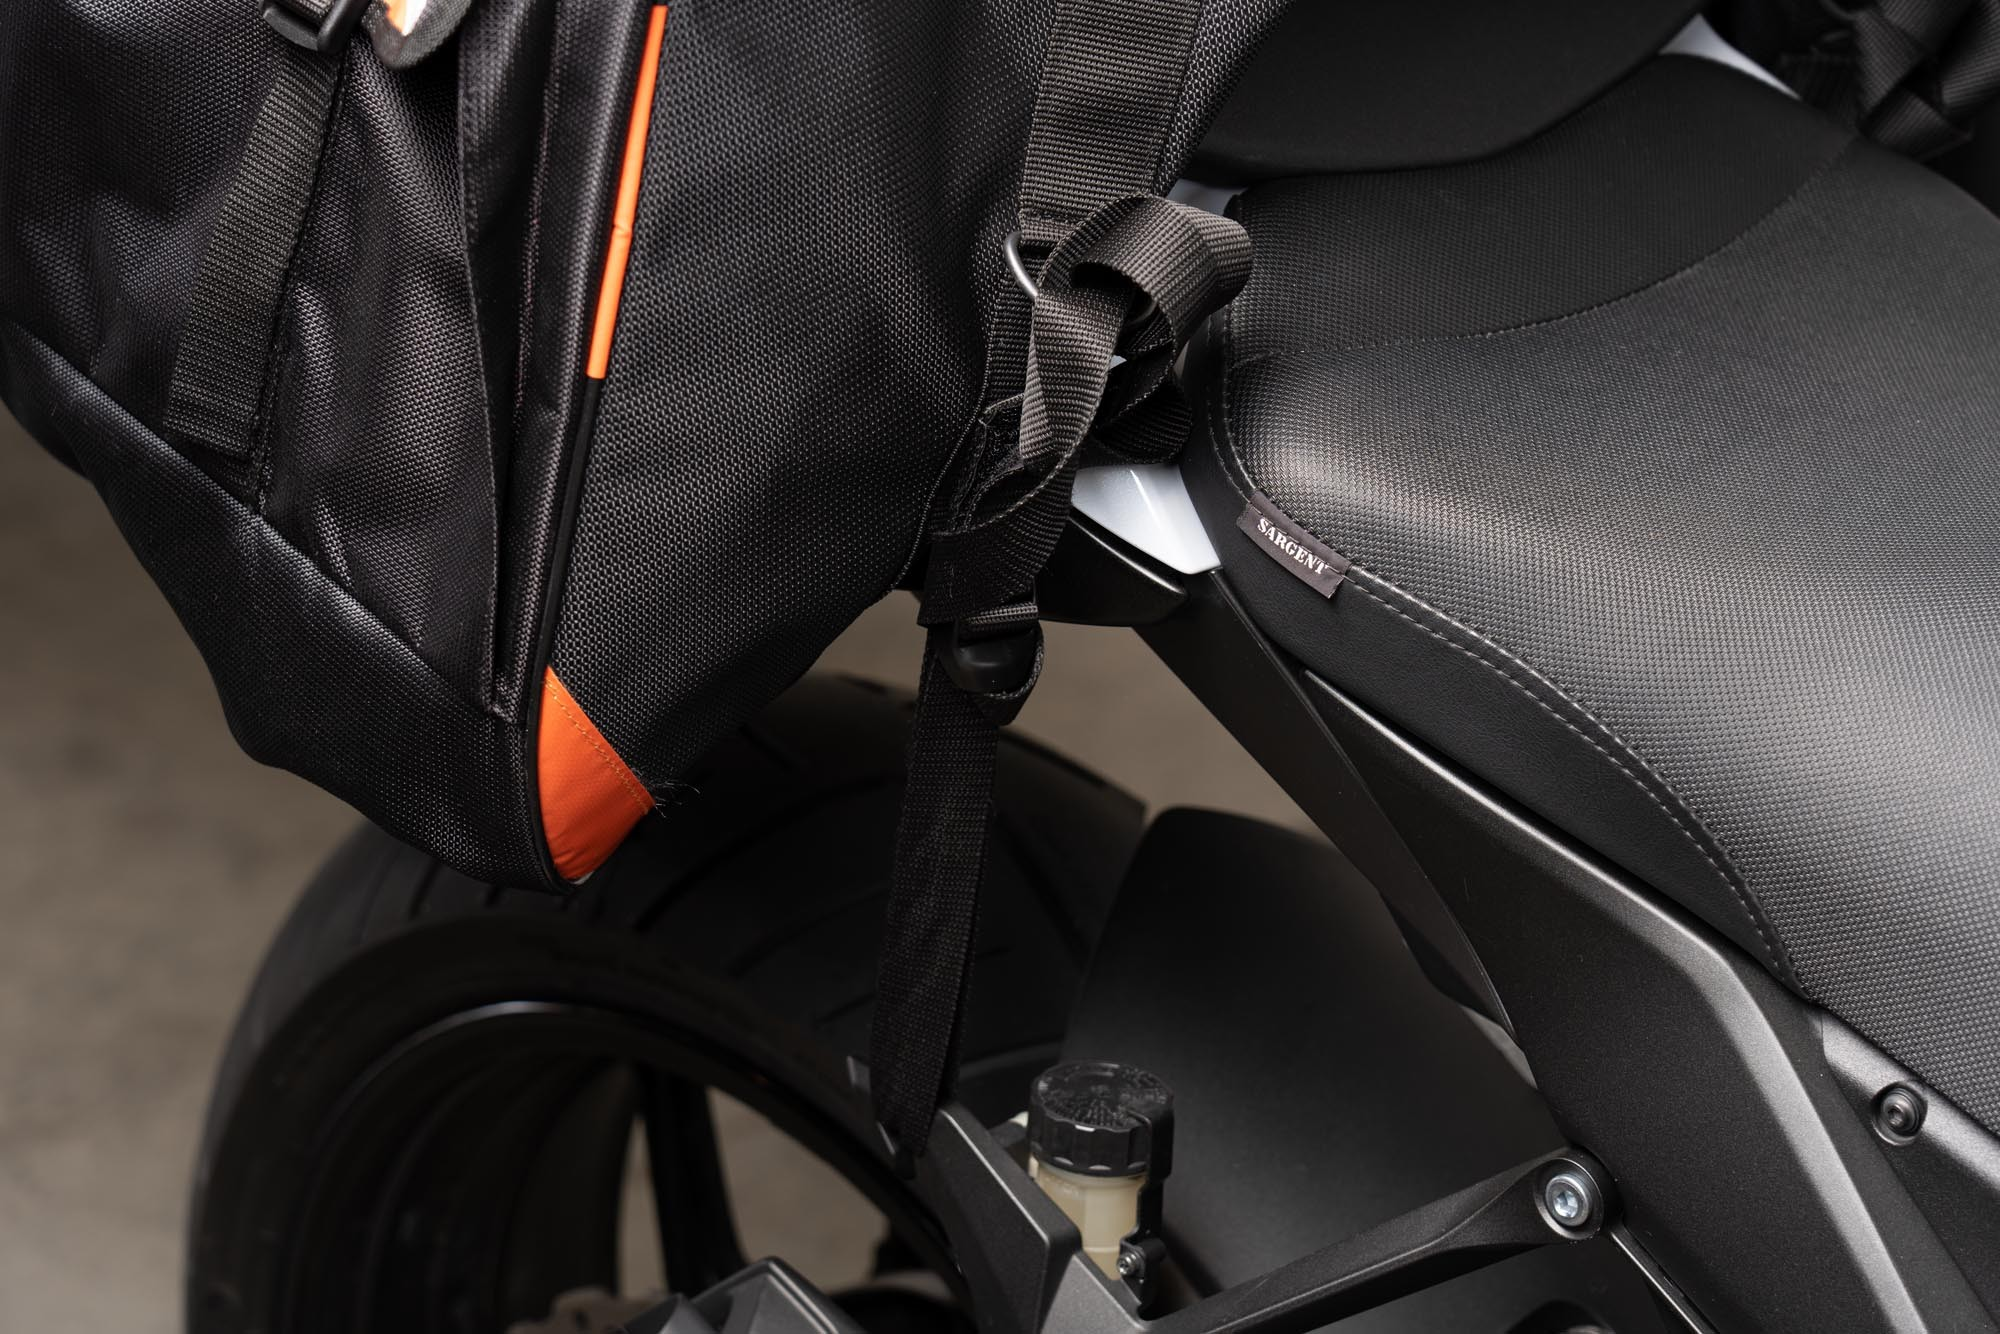 70086 Sentor bag attached to Ninja 1000 using footpeg luggage hooks